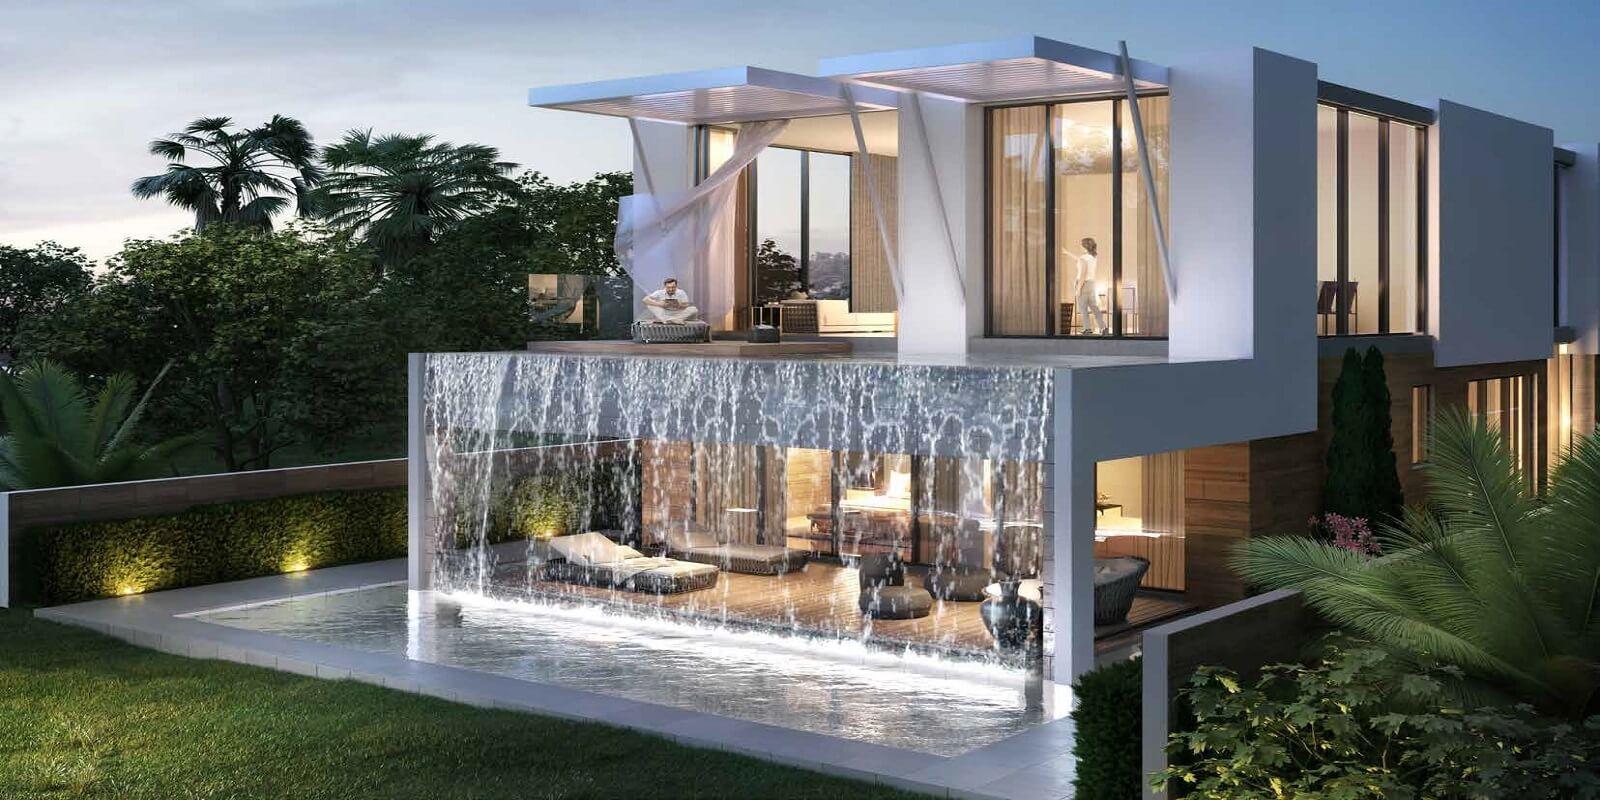 xv villas at akoya oxygen project large image2